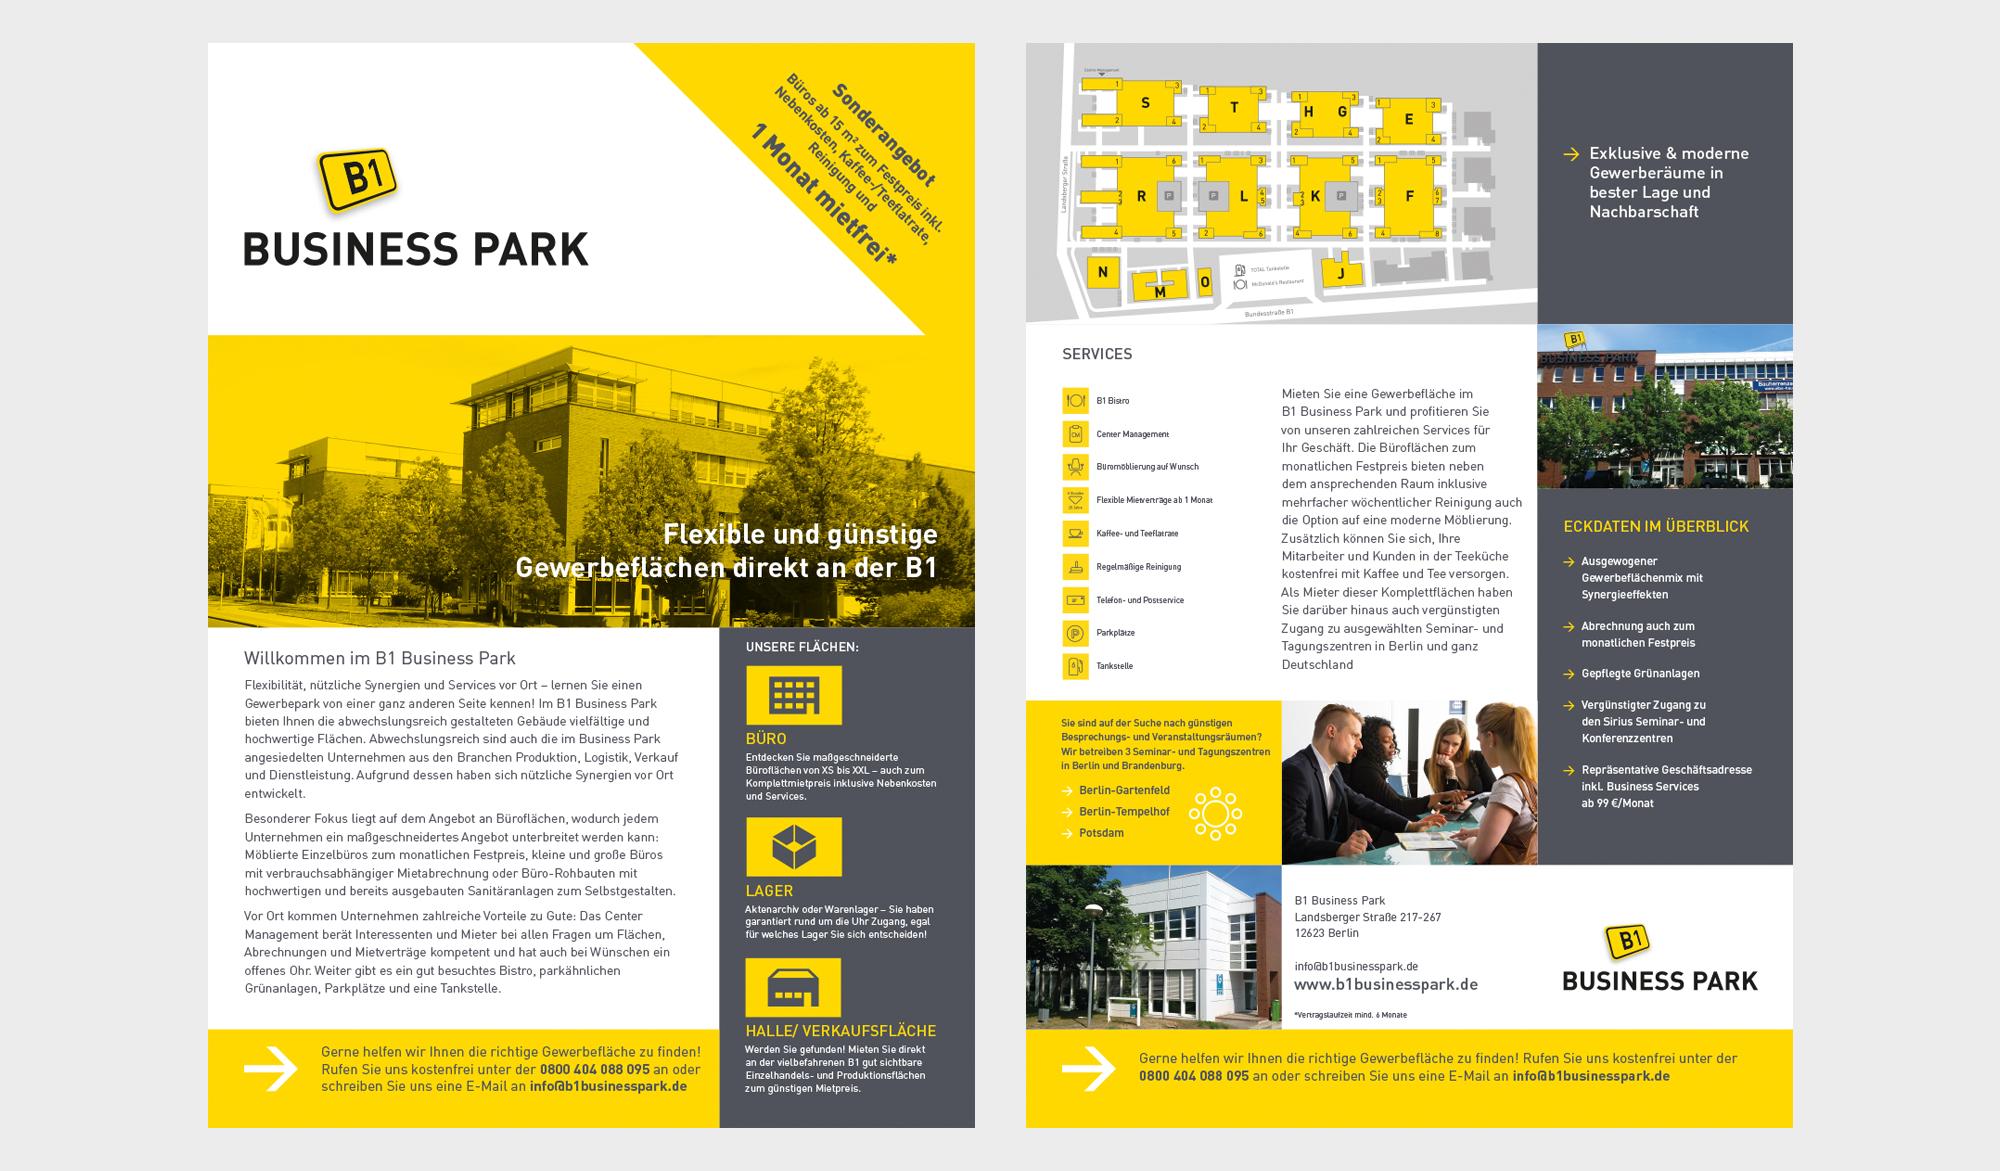 B1 Business Park brochure